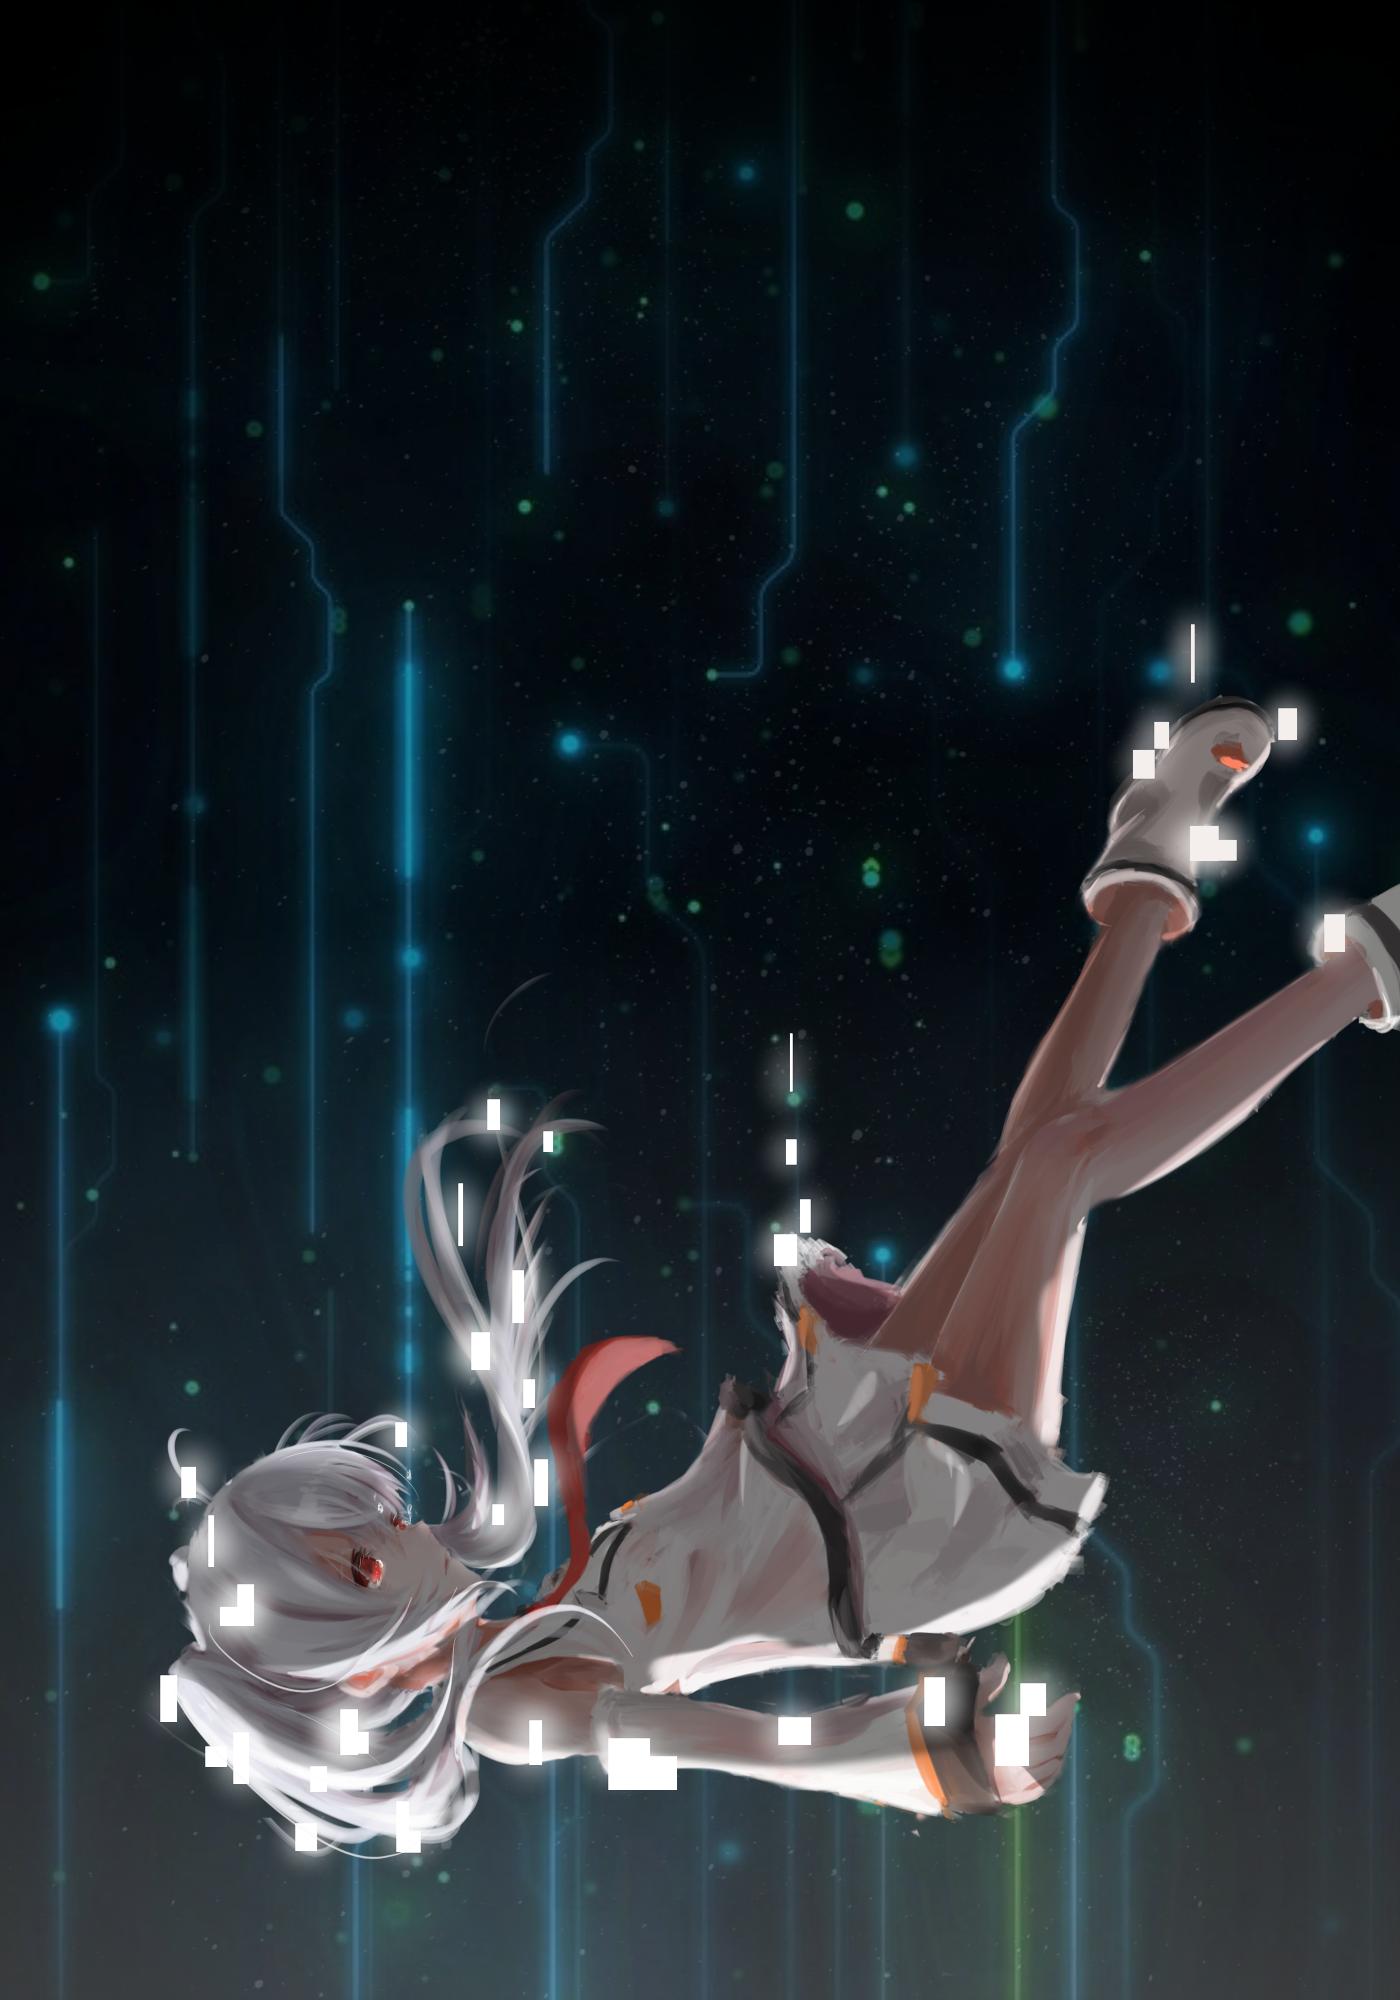 Isla Plastic Memories Anime triste, Anime kawaii e Anime